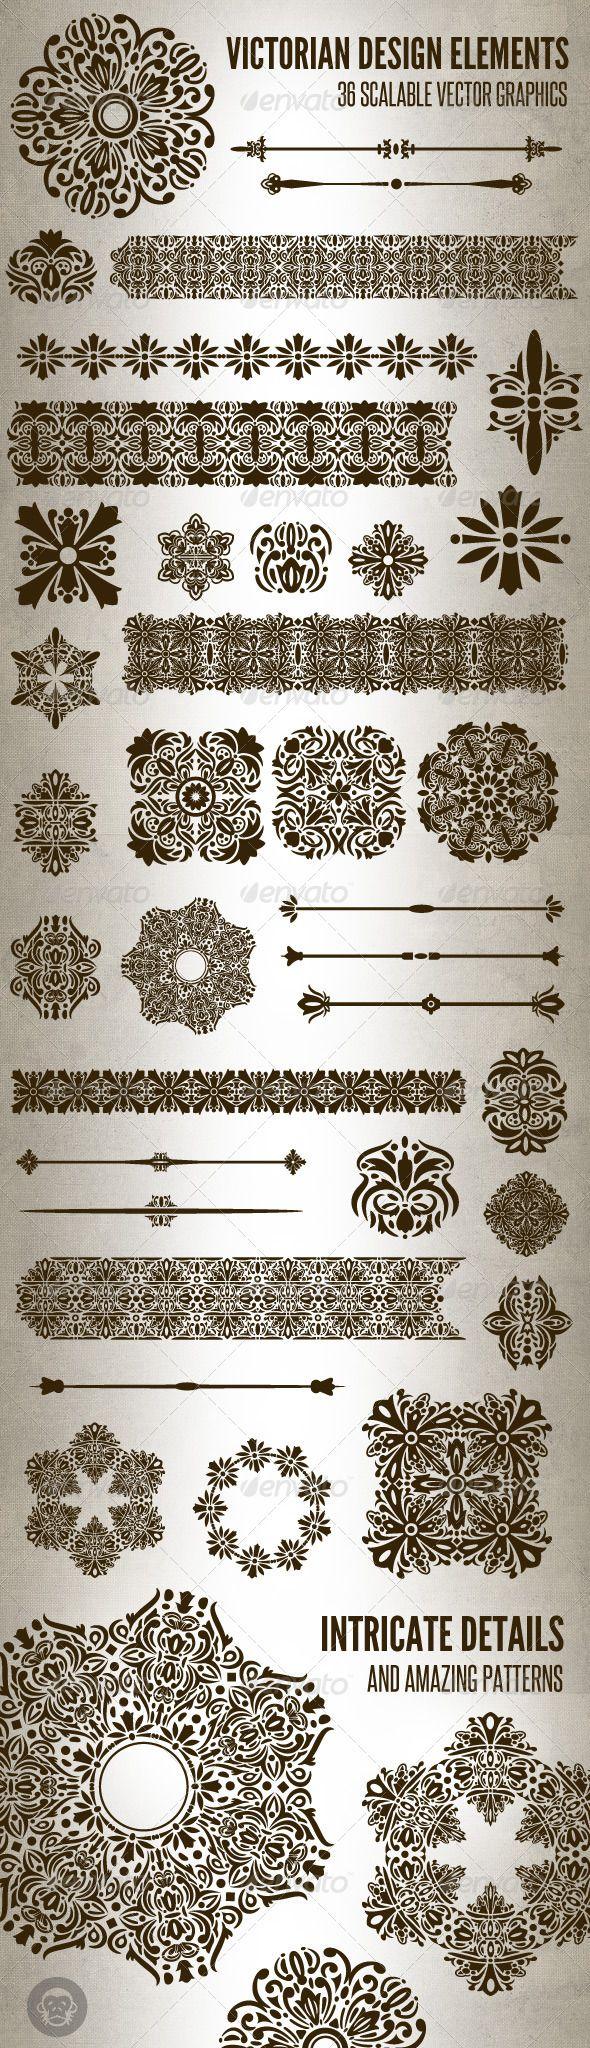 36 Victorian Design Elements Design Elements Victorian Design